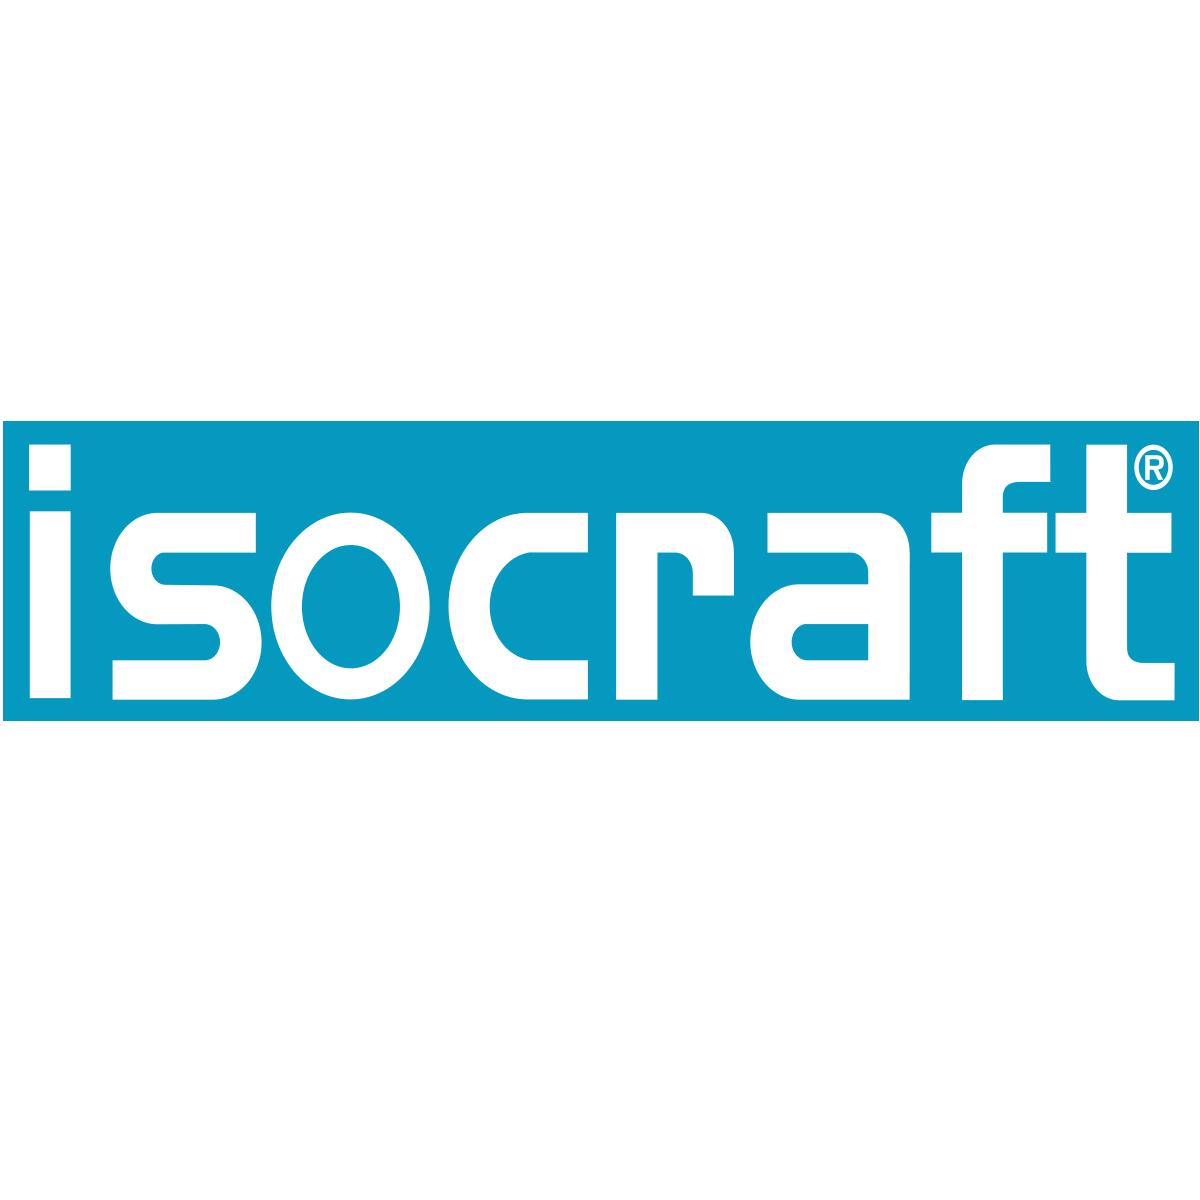 Isocraft vulling